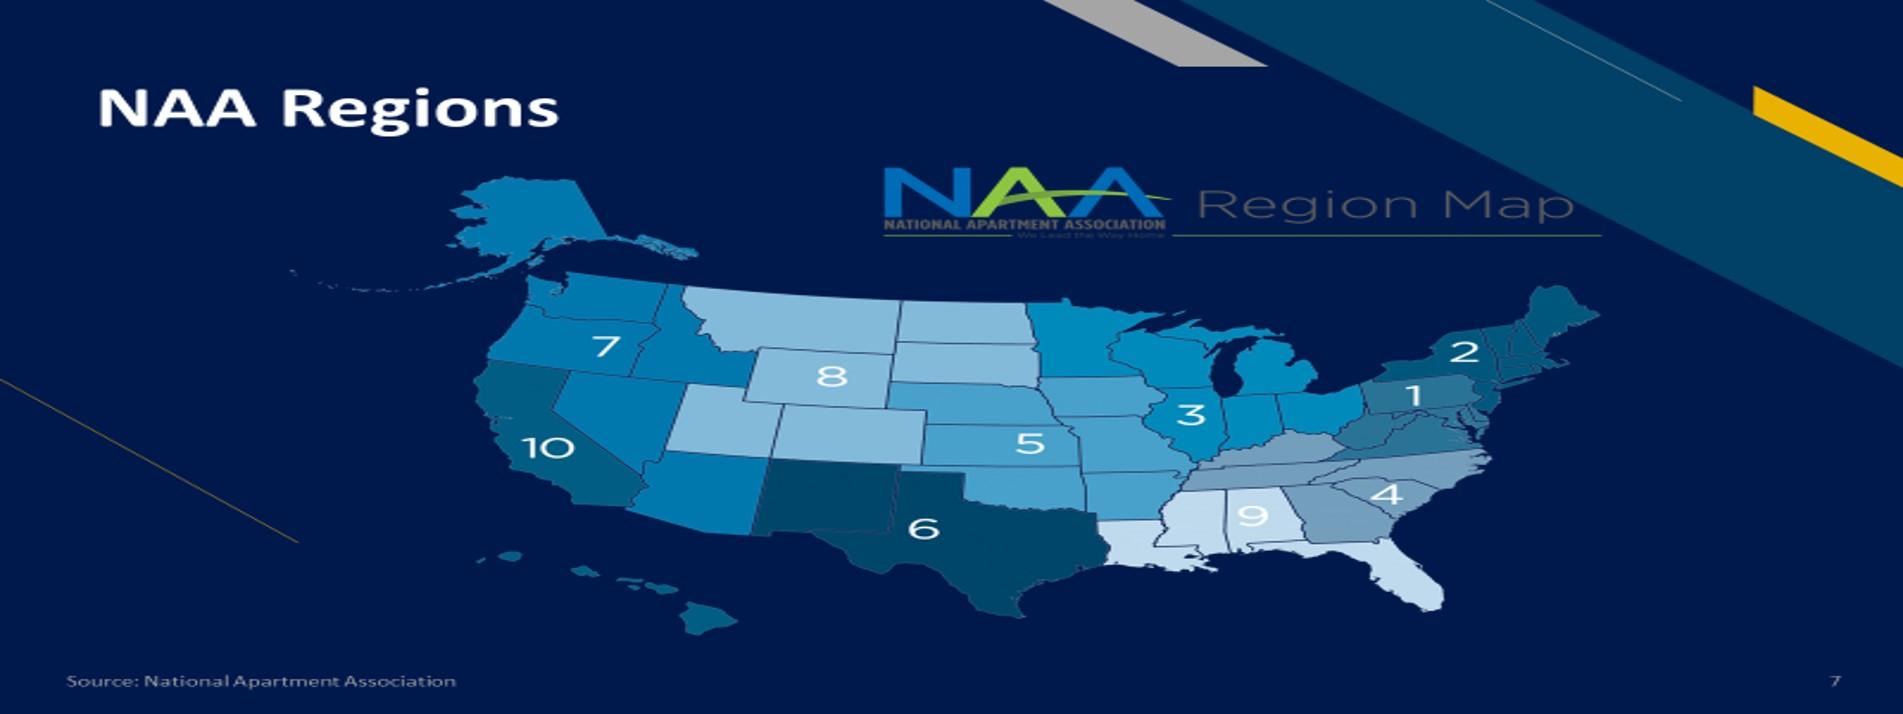 NAA Region Map